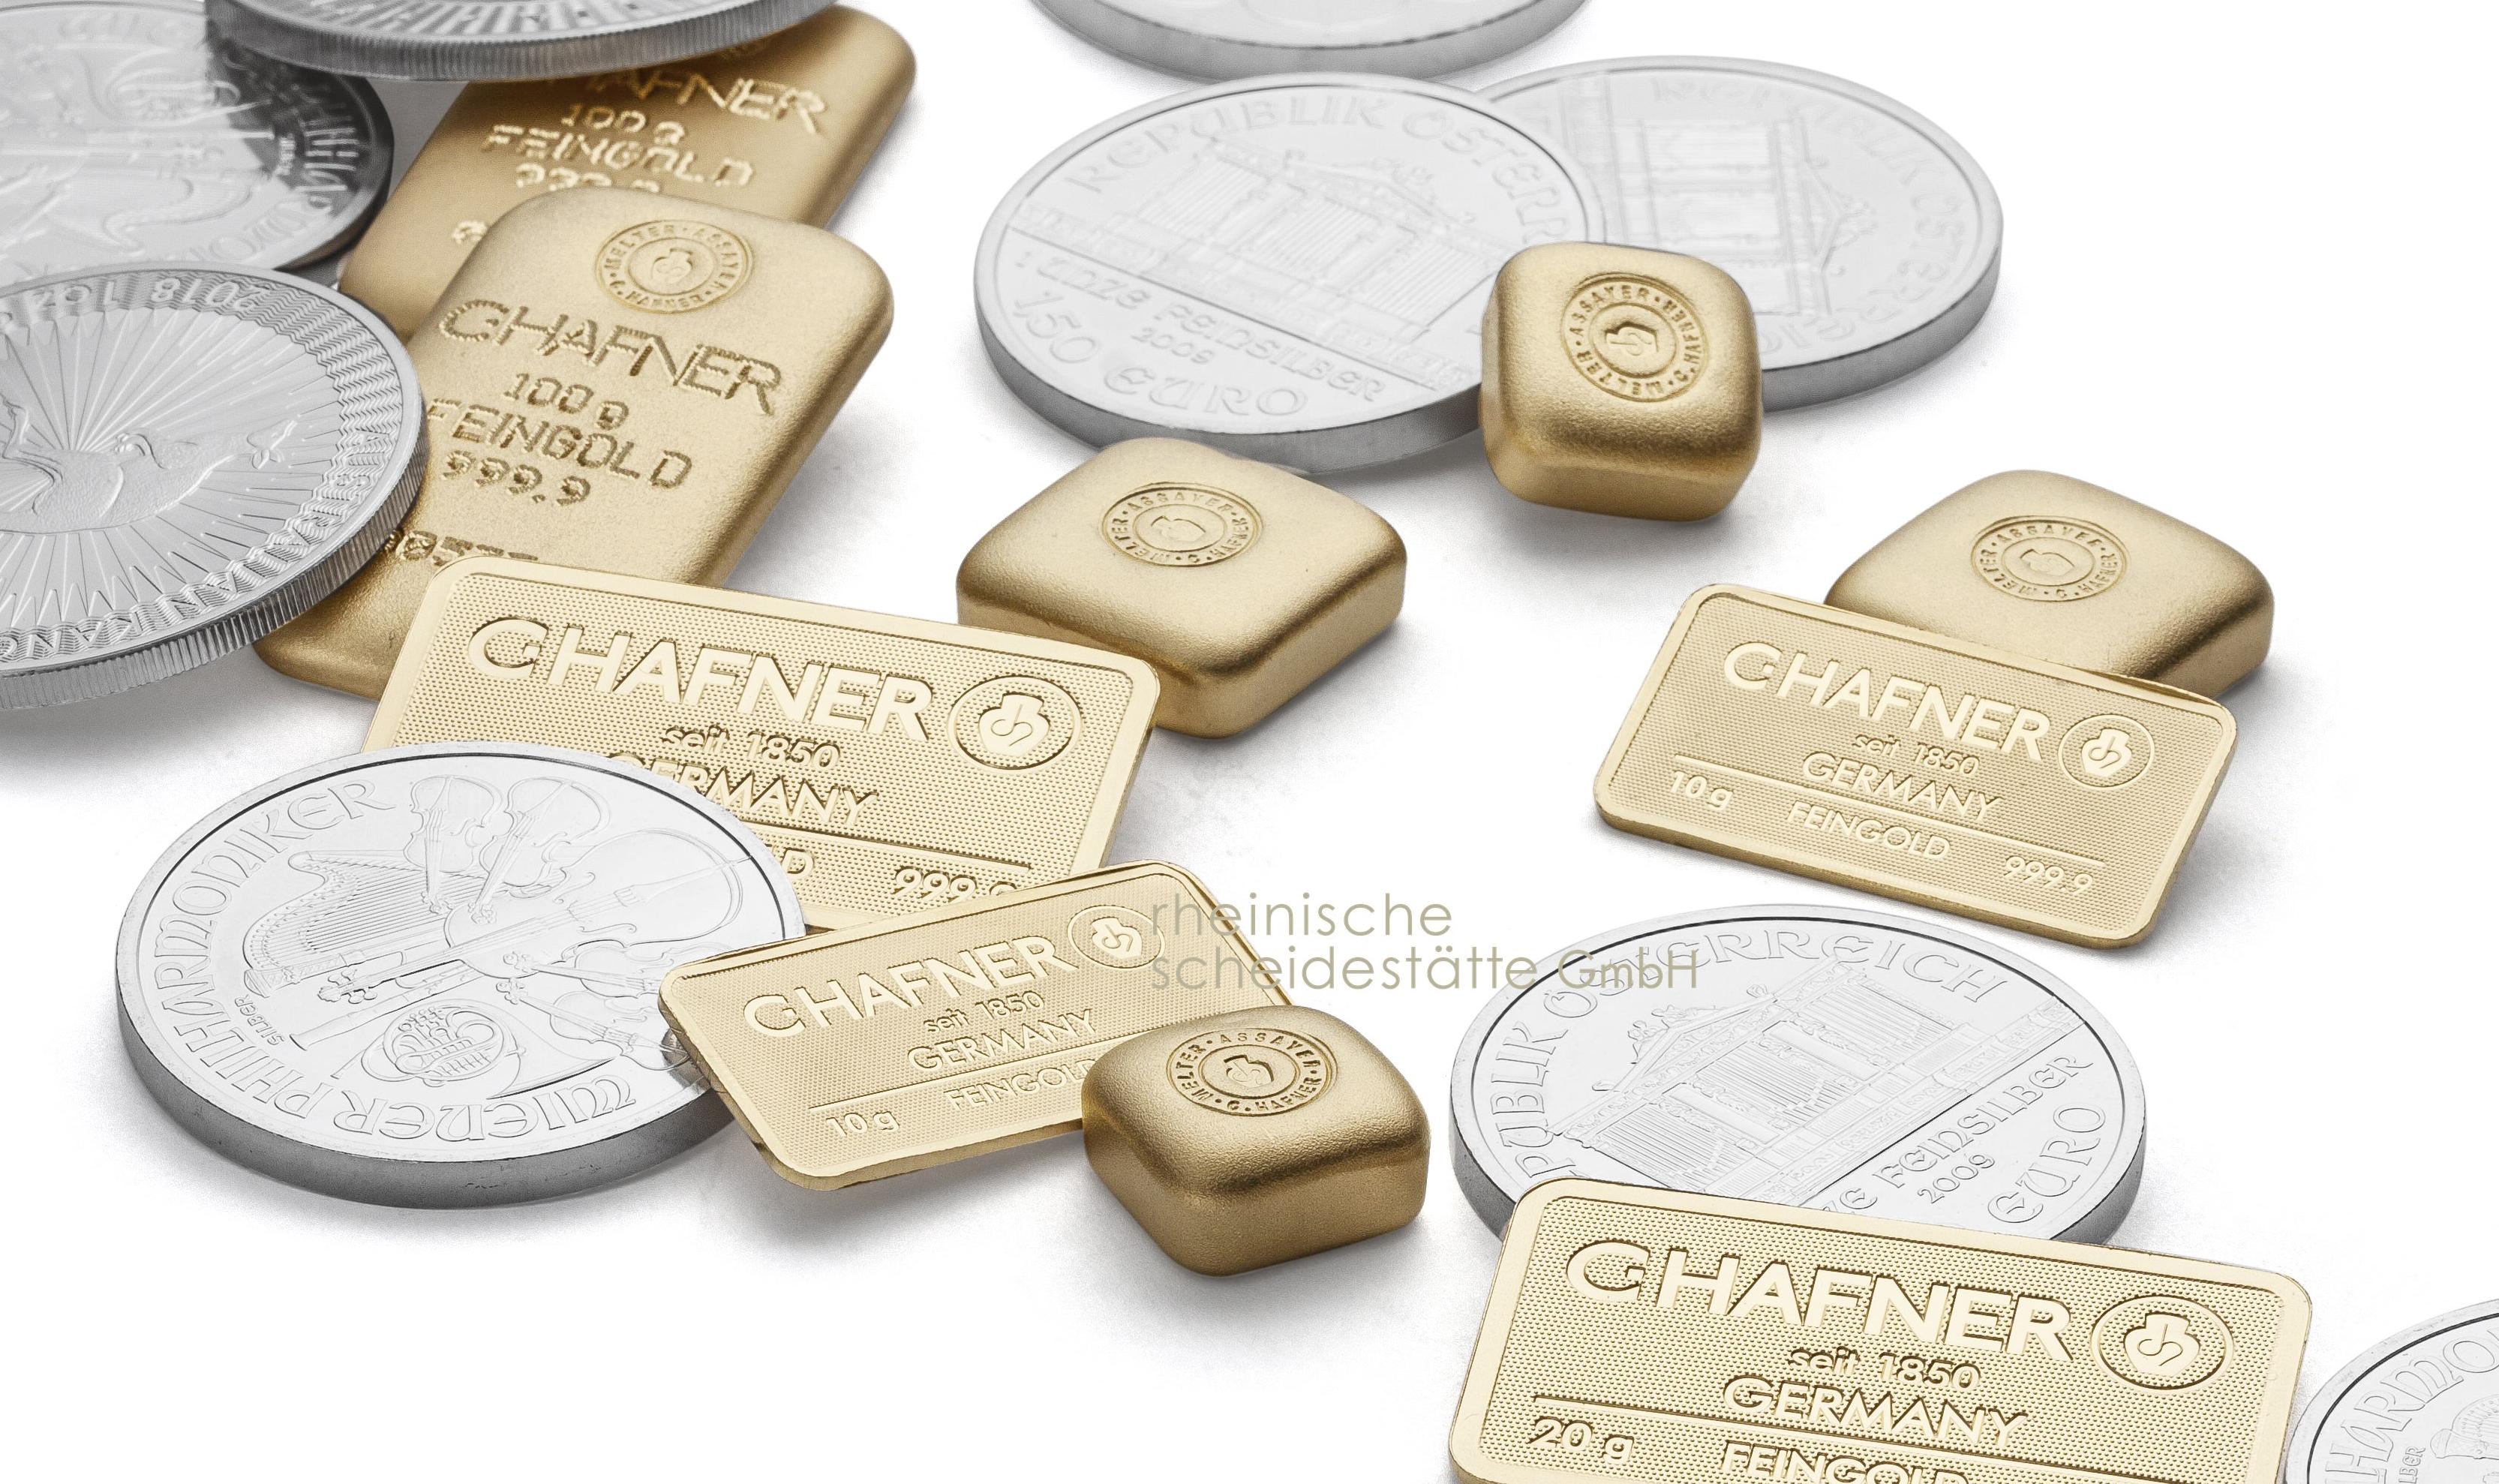 goldpreis verkauf trier bild